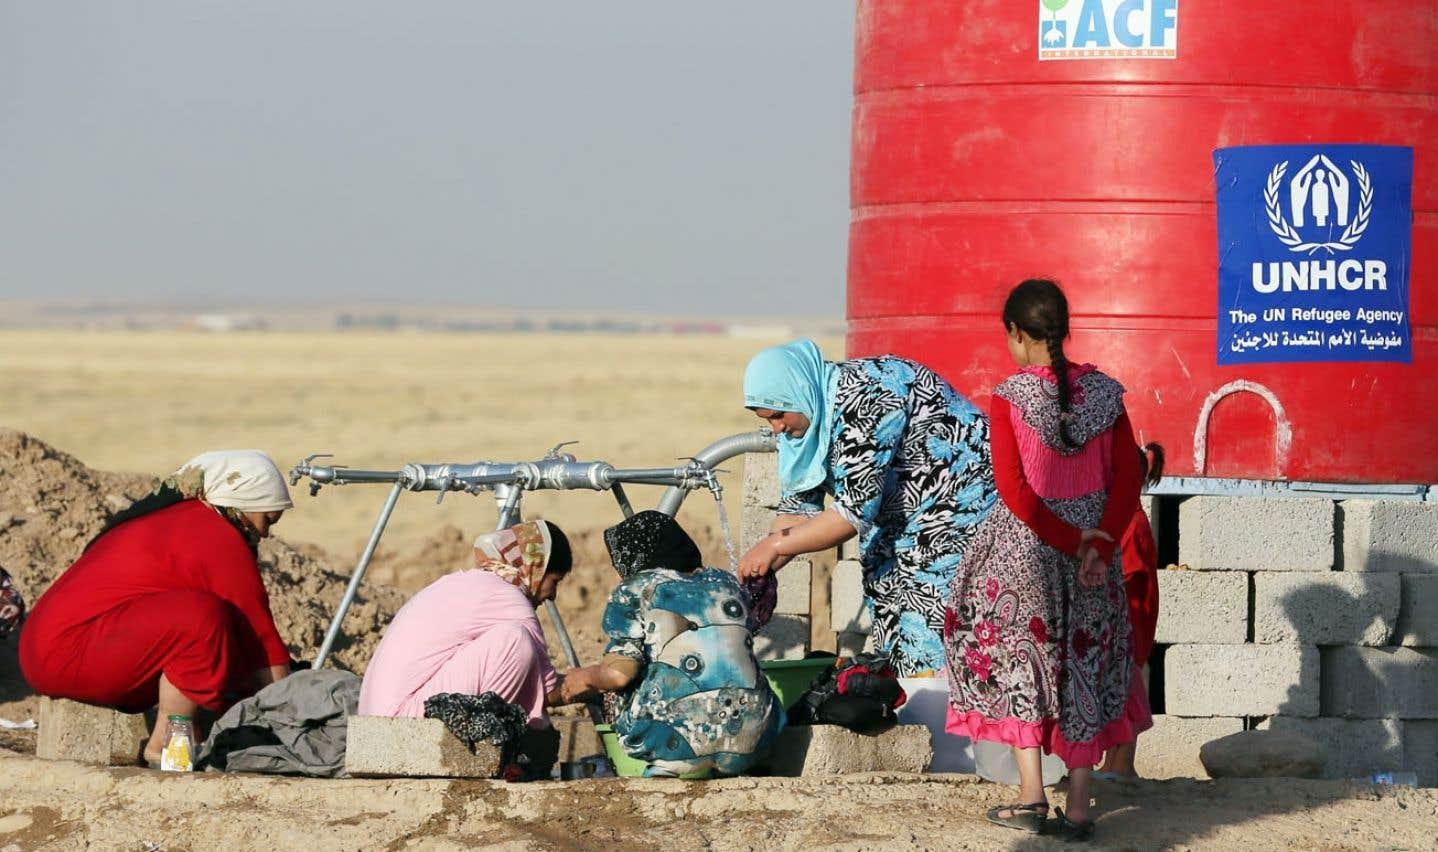 Les djihadistes attaquent la principale raffinerie du pays